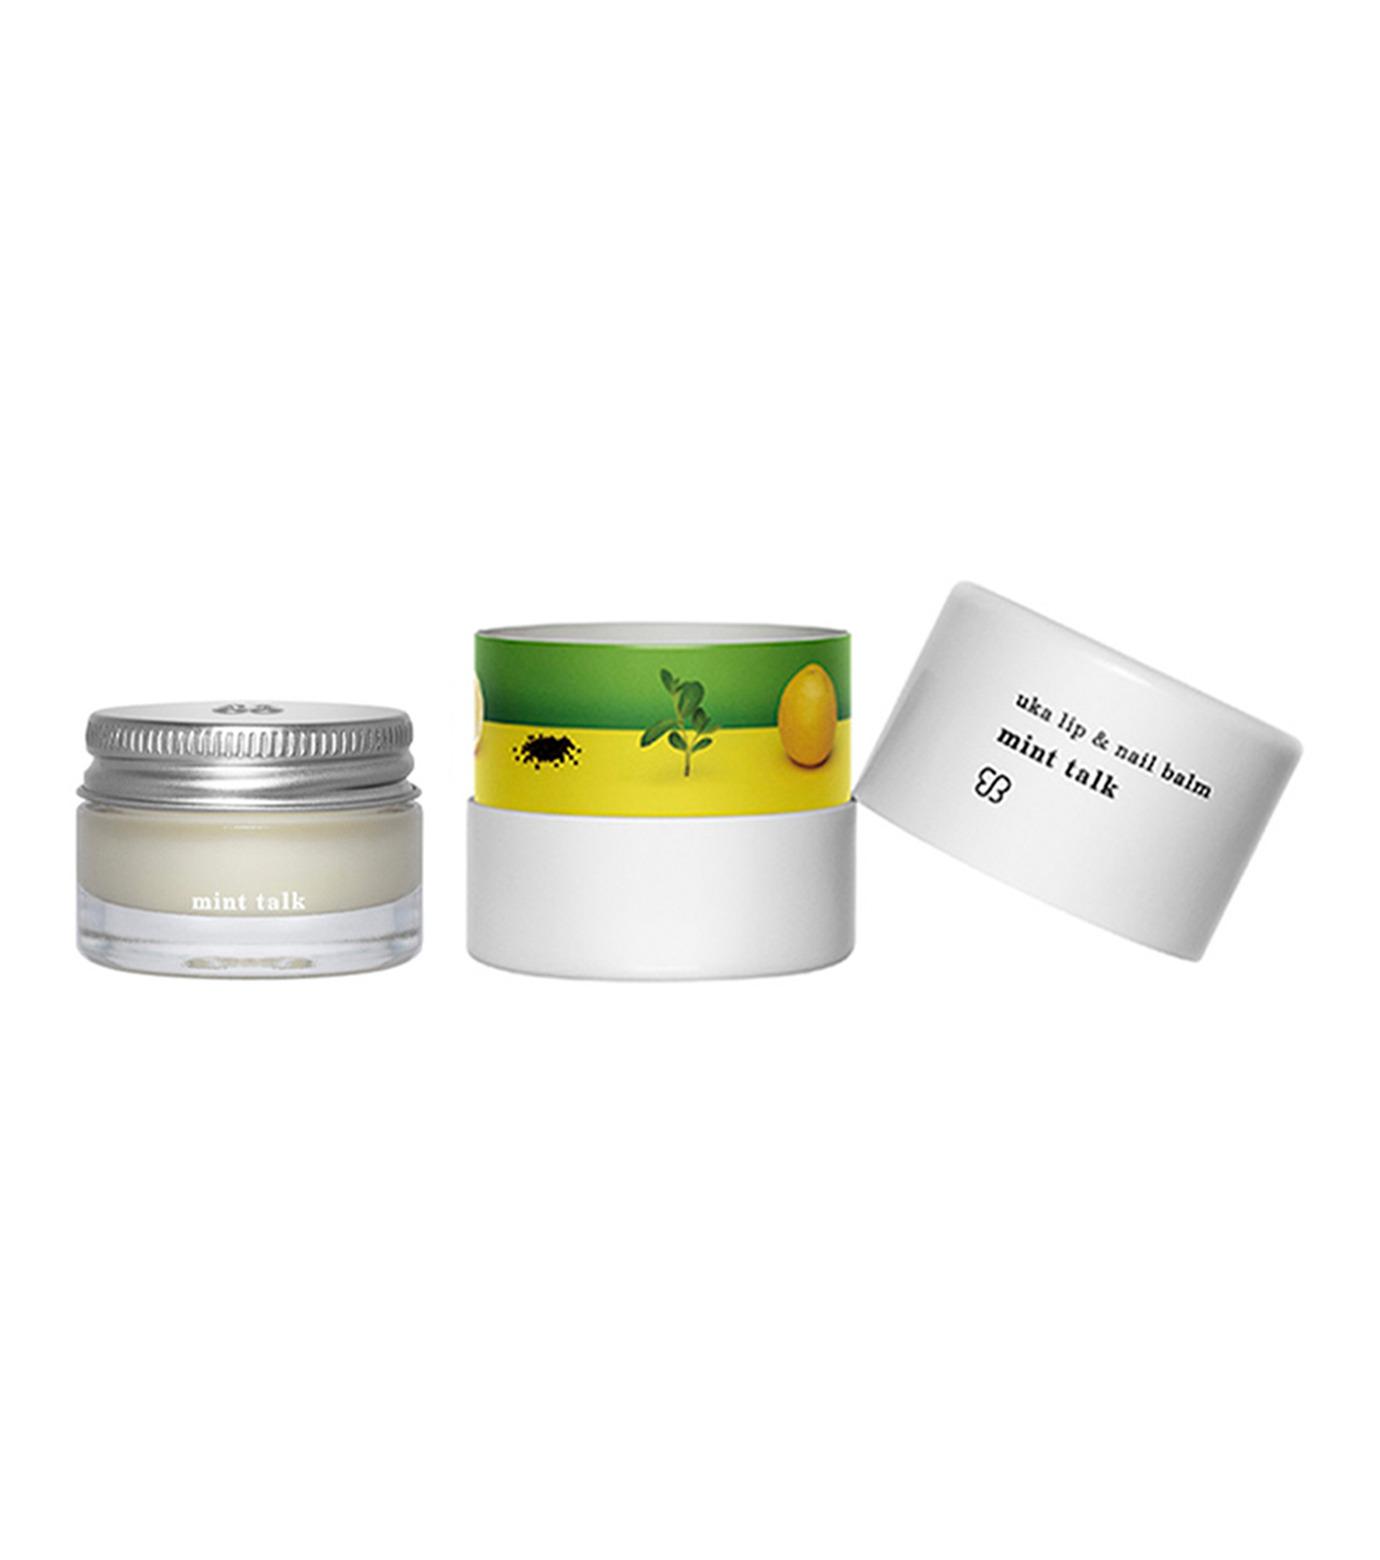 uka(ウカ)のuka lip & nail balm mint talk-WHITE(コスメティックス/cosmetics)-3000019-4 拡大詳細画像1